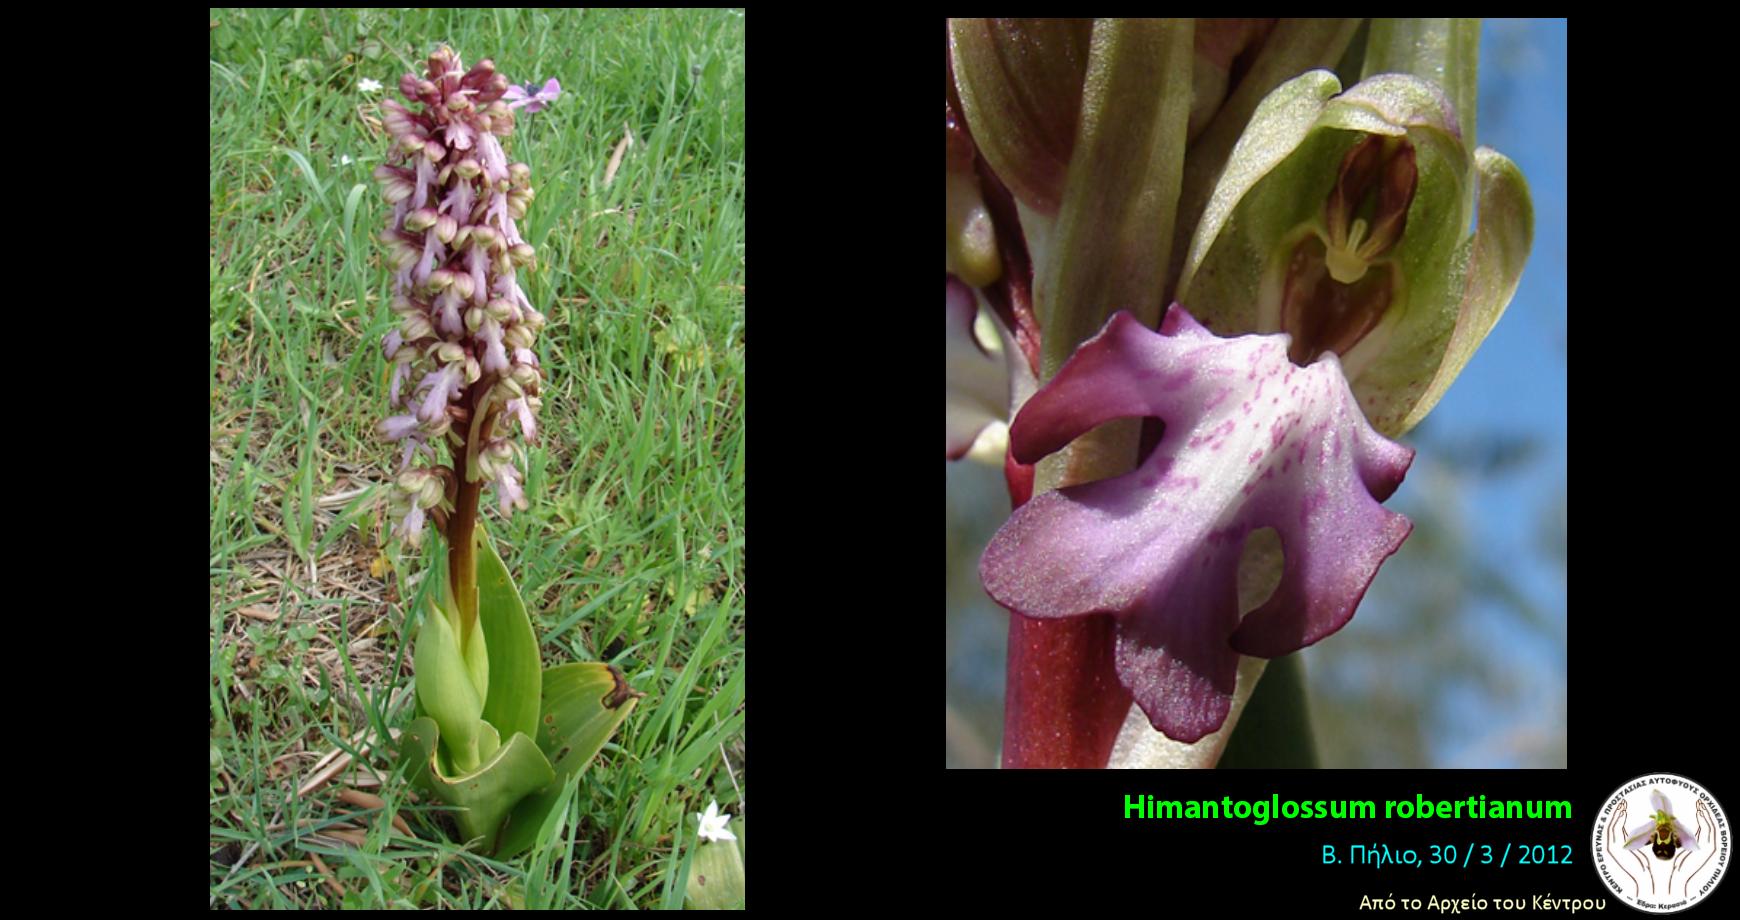 Himantoglossum robertianum